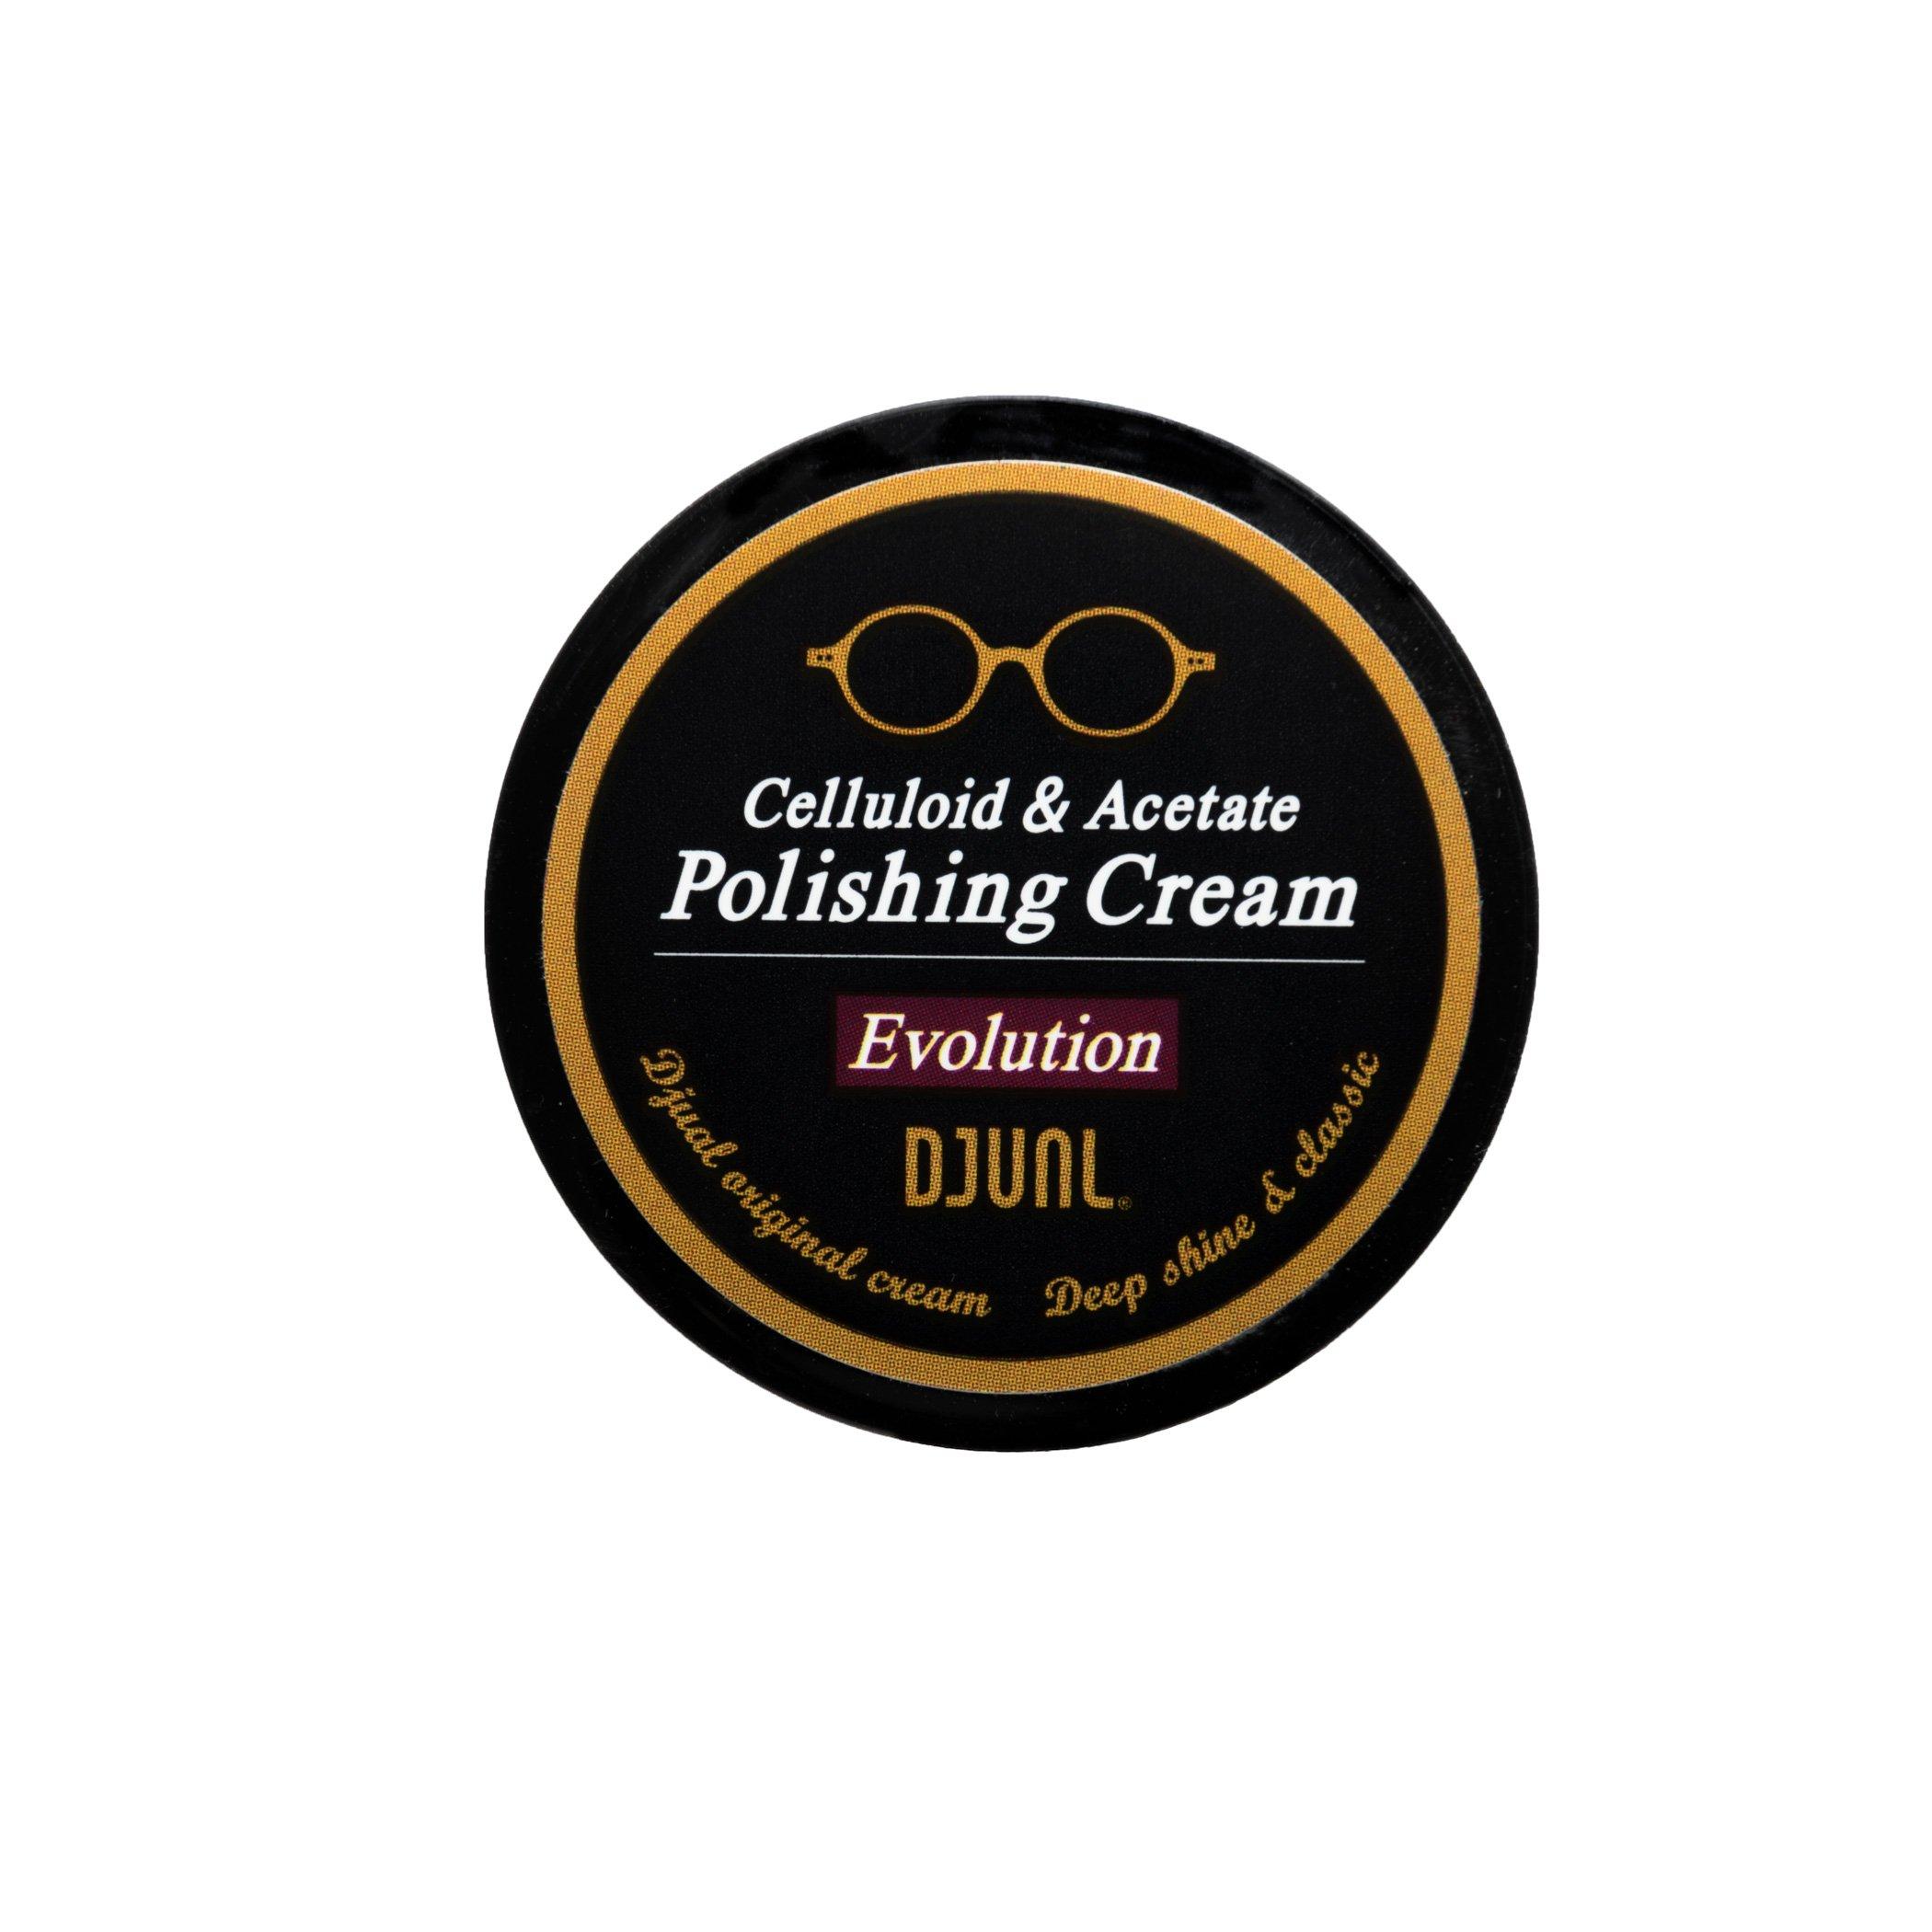 DJUAL Celluloid & Acetate Polishing Cream - Plastic Eyeglass Frames Cleaner